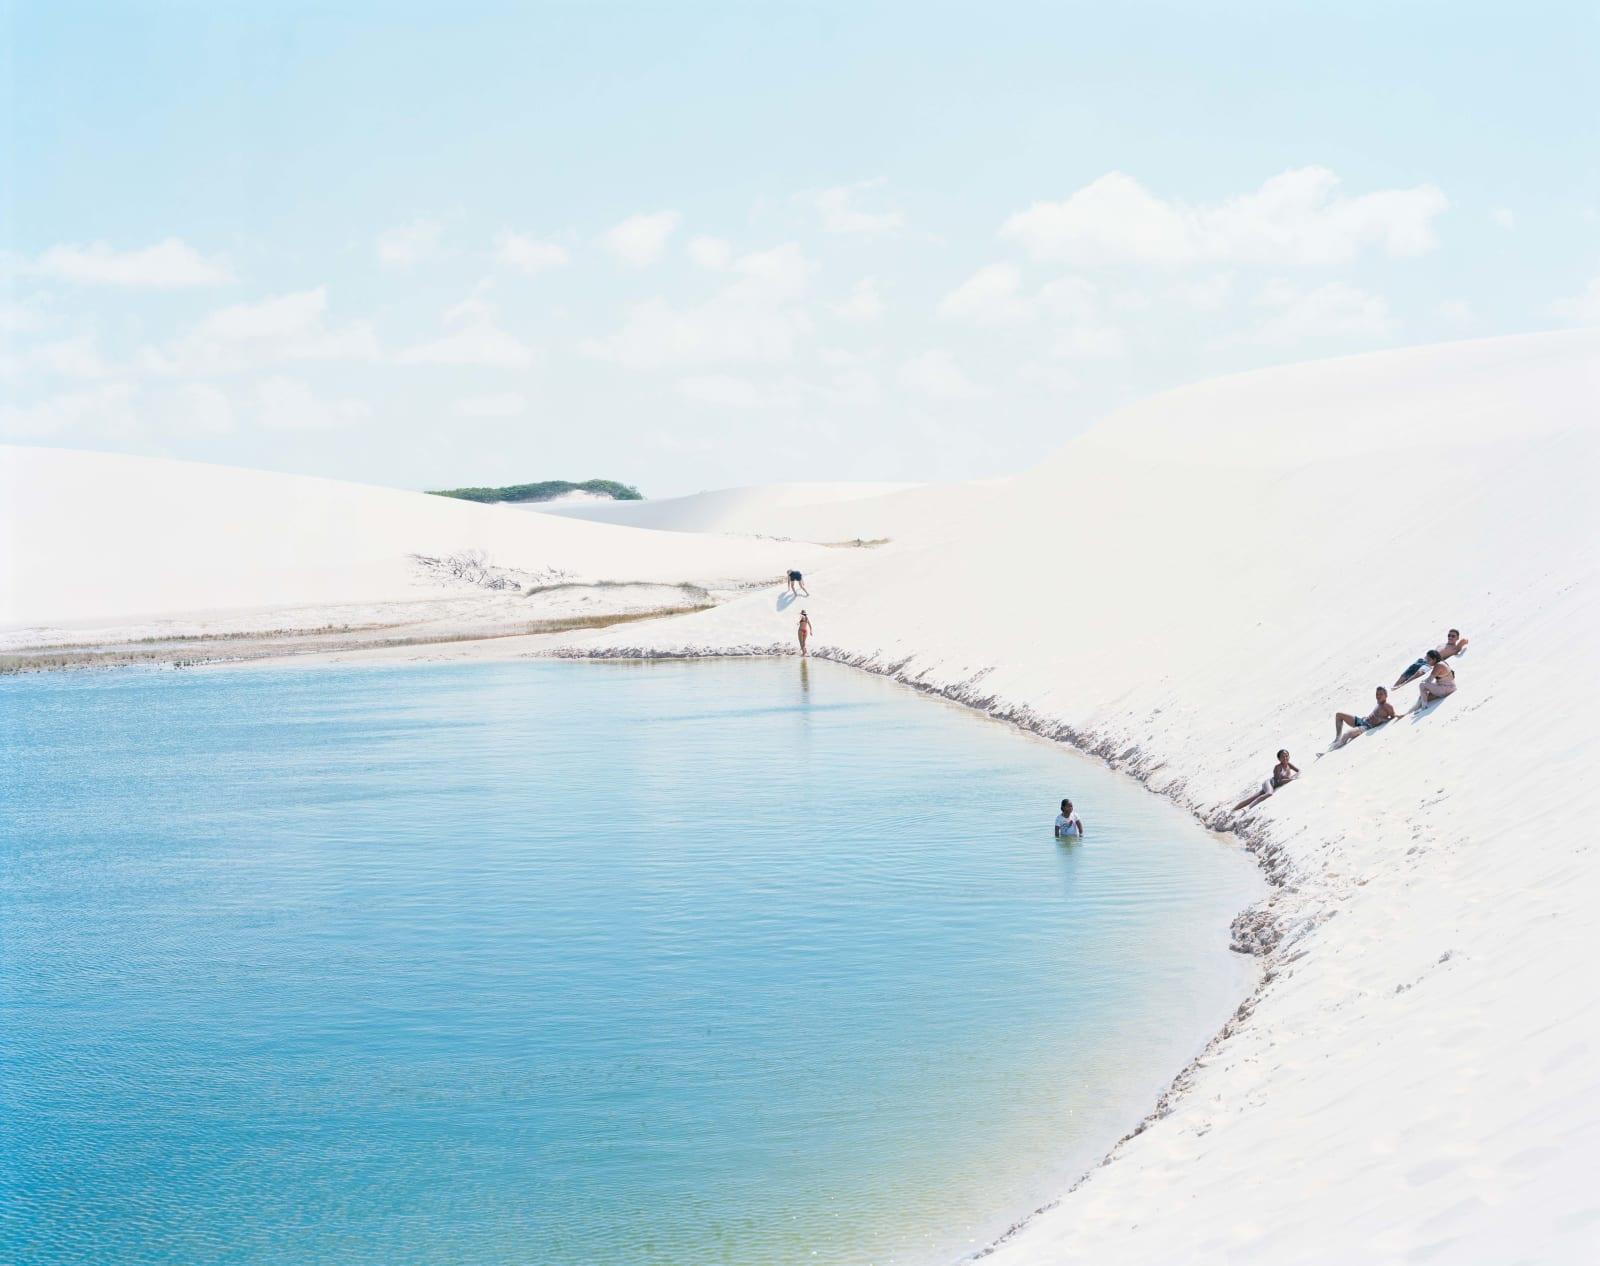 Sunbathers on white sand dunes relaxing next to blue water, at Lençóis Maranhenses National Park, Brazil, by Massimo Vitali